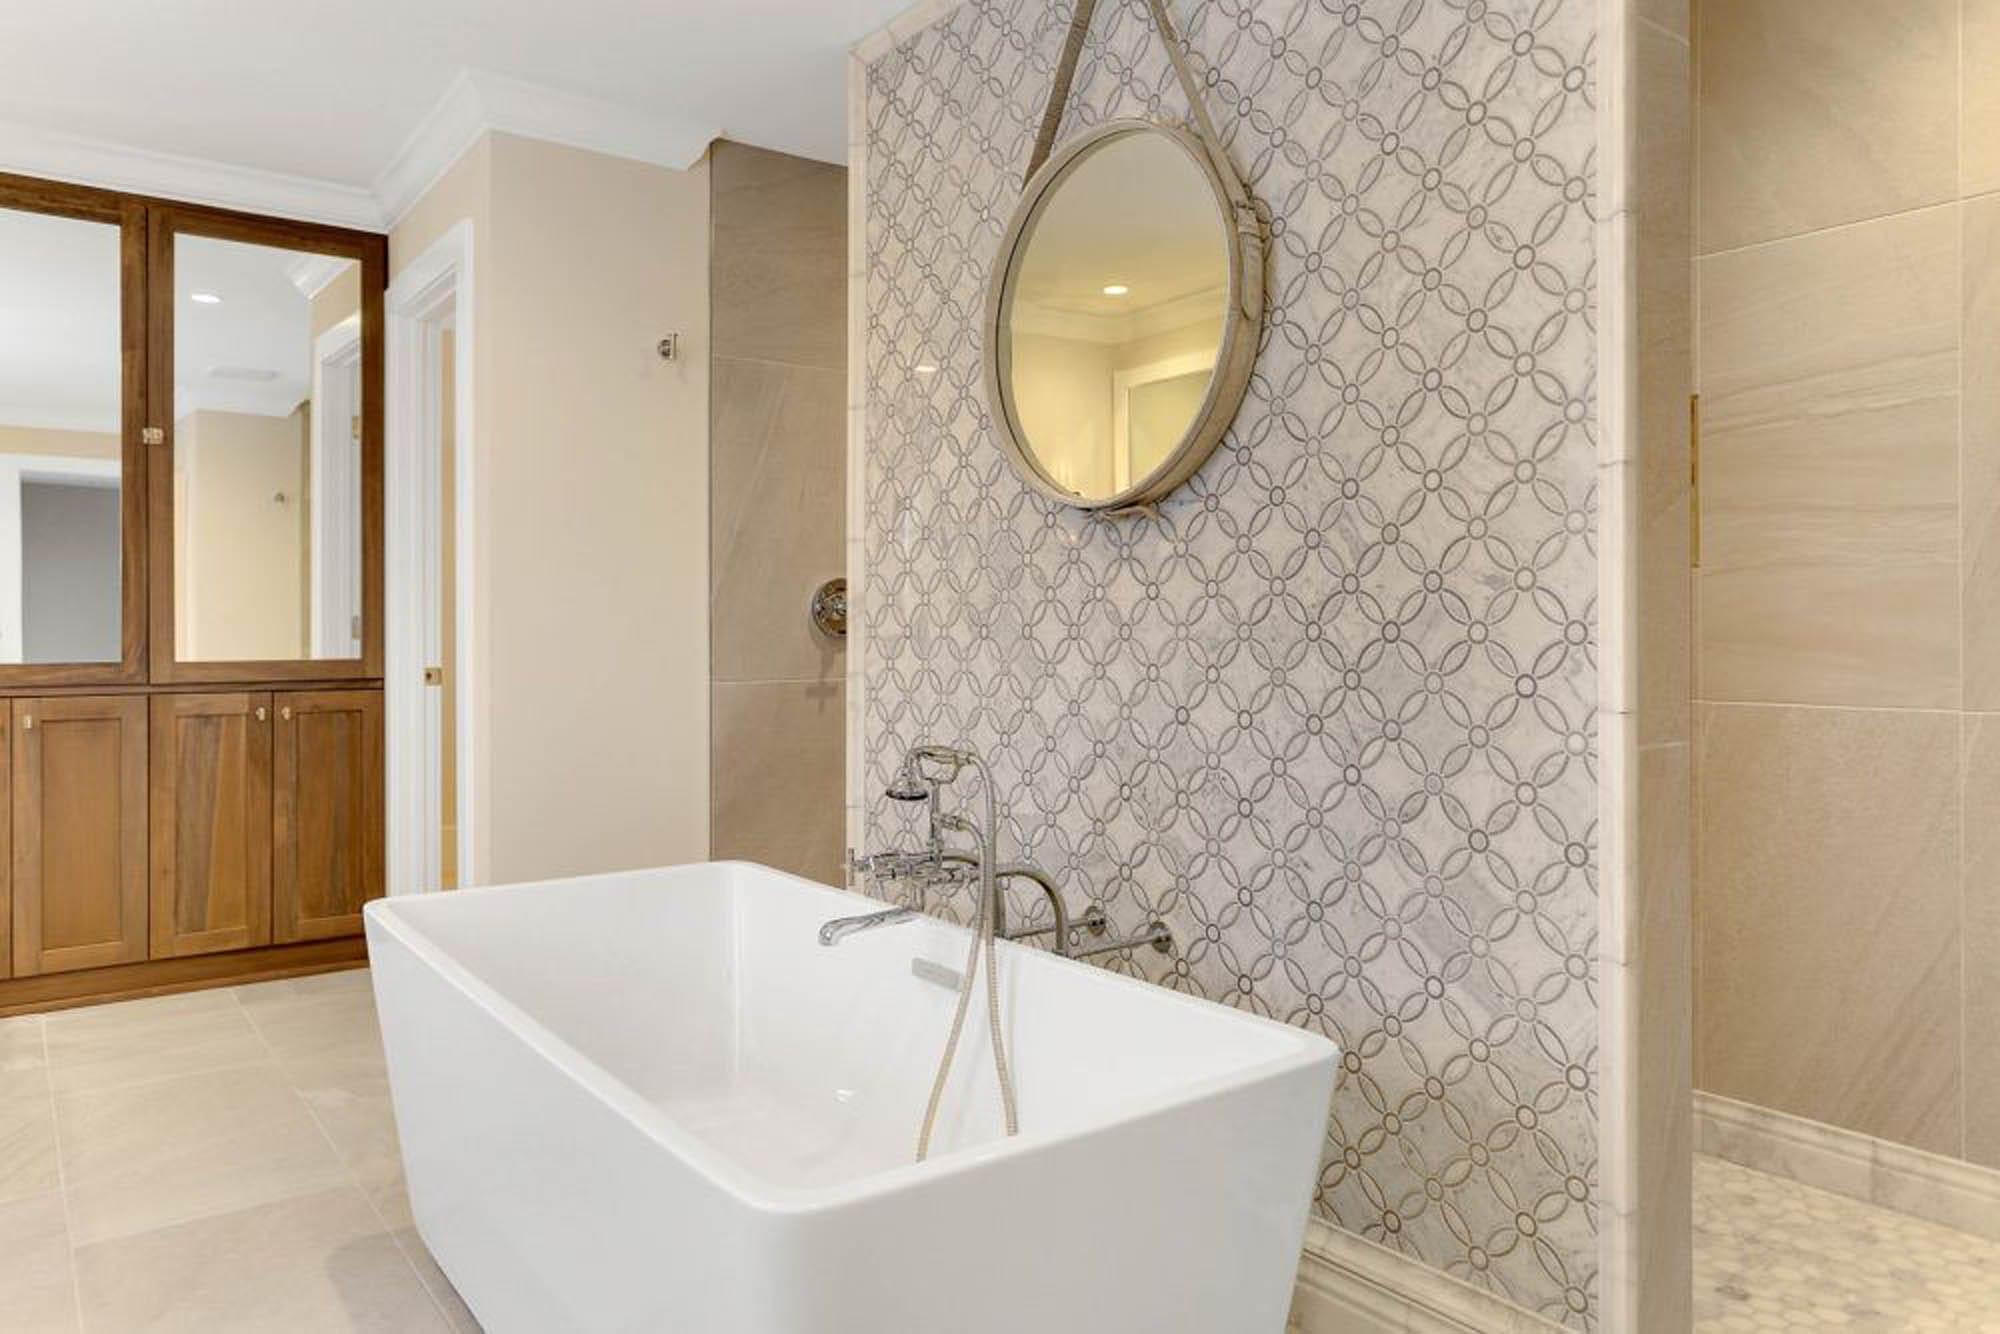 Beautiful bathroom with mosaic tile and bathtub